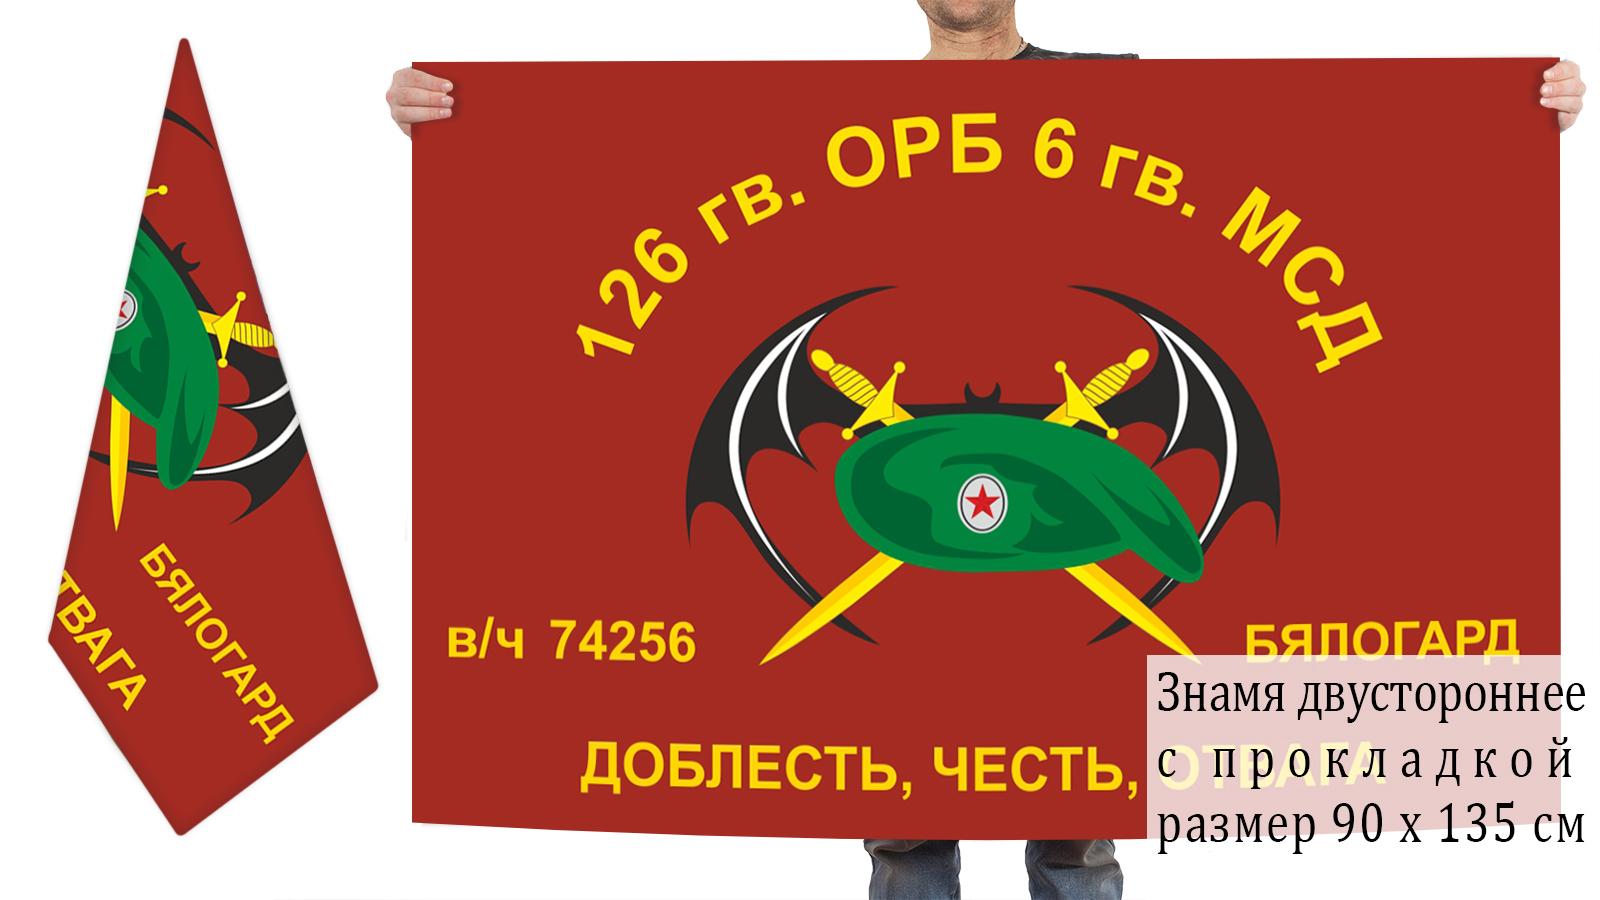 Двусторонний флаг 126 отдельного разведбата 6 гвардейской МСД